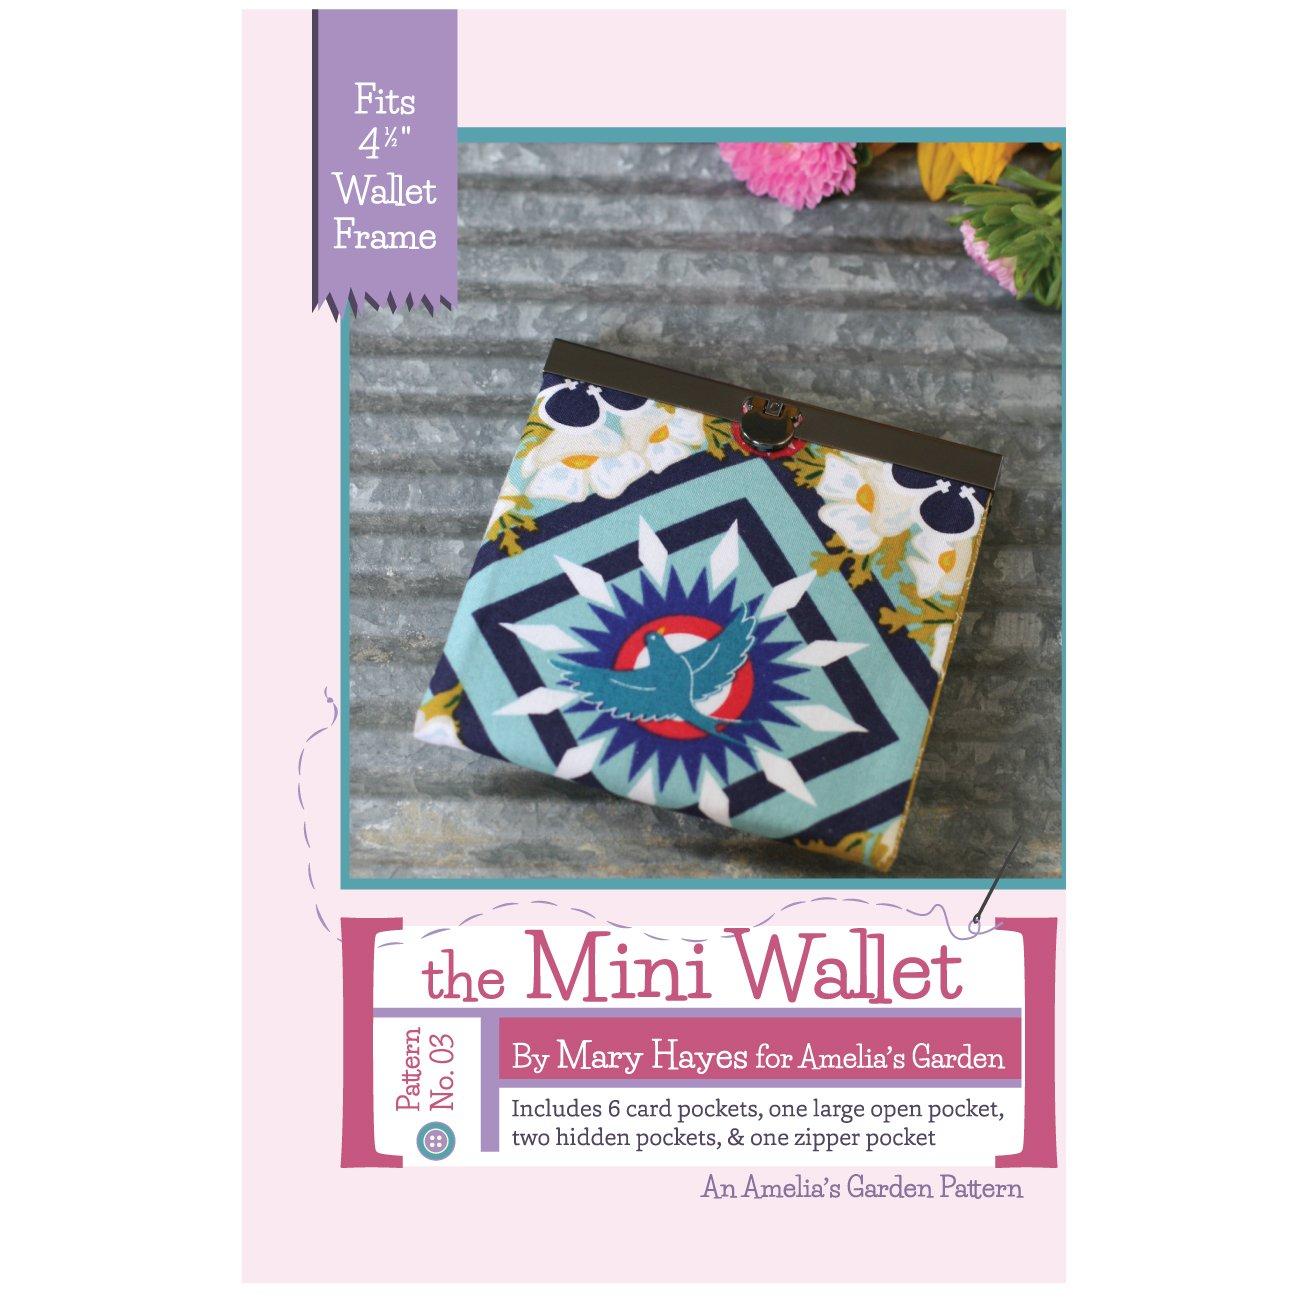 the Mini Wallet